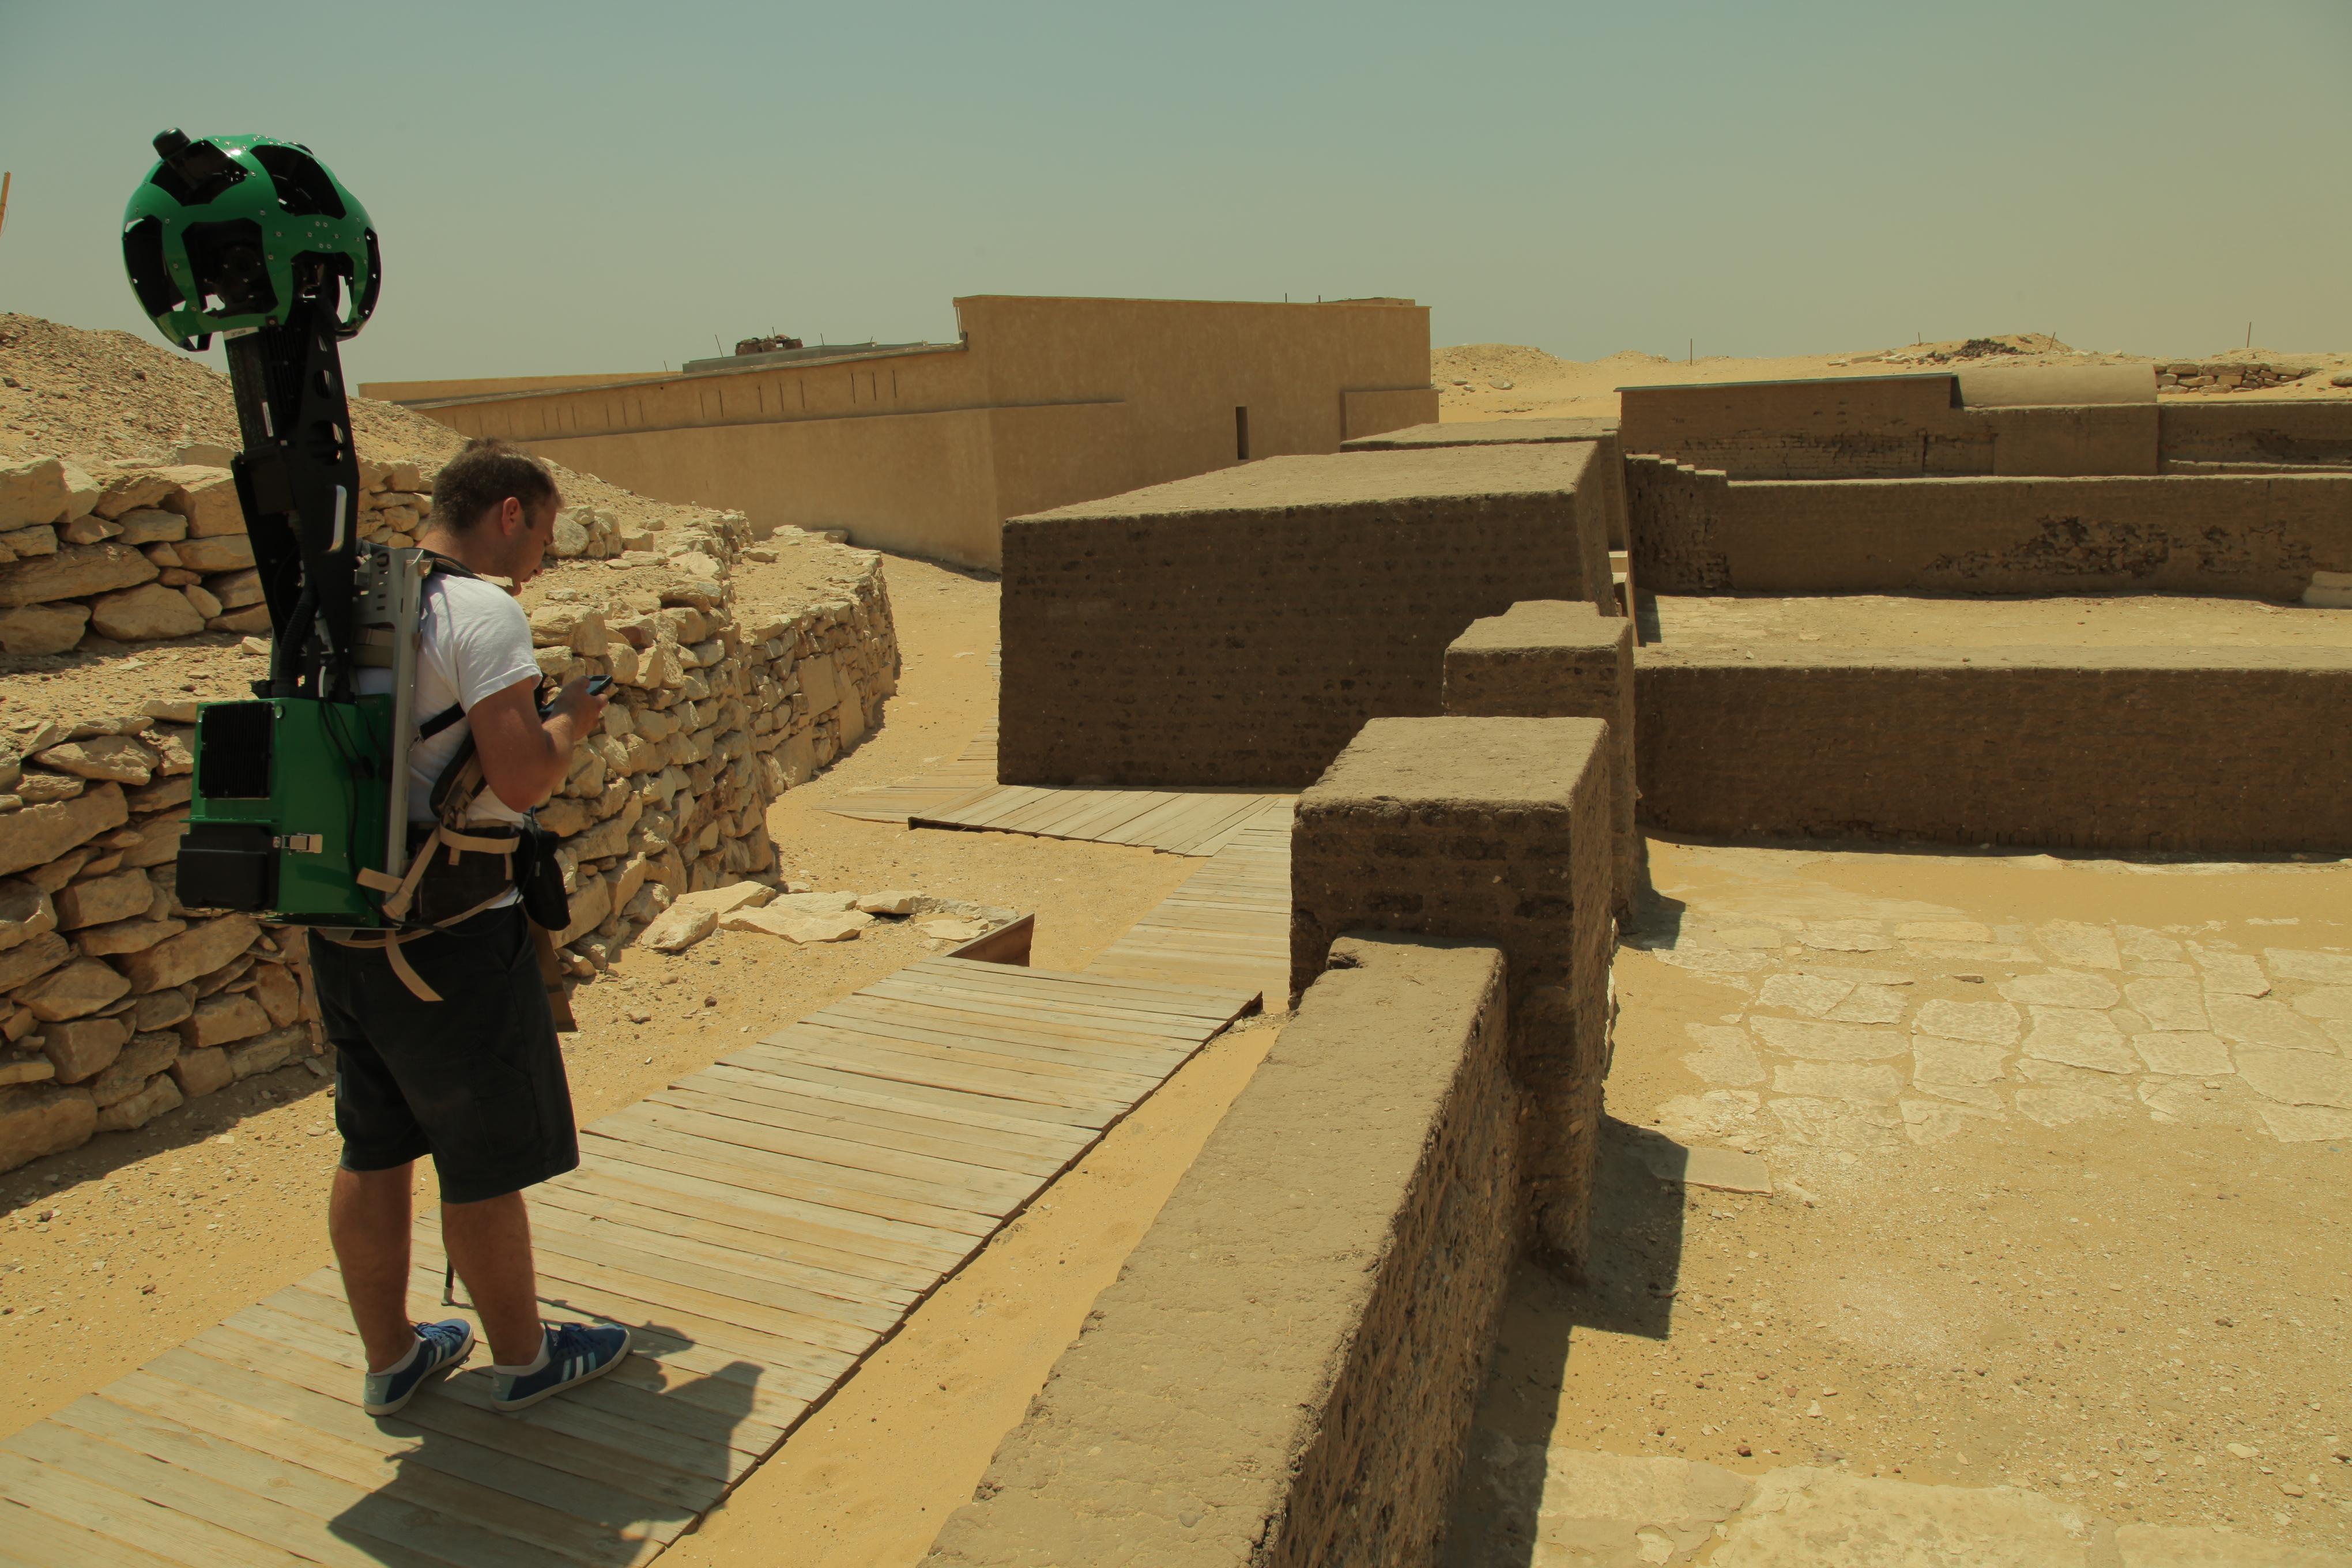 A Street View operations team member wearing a Trekker in Saqqara, Egypt.